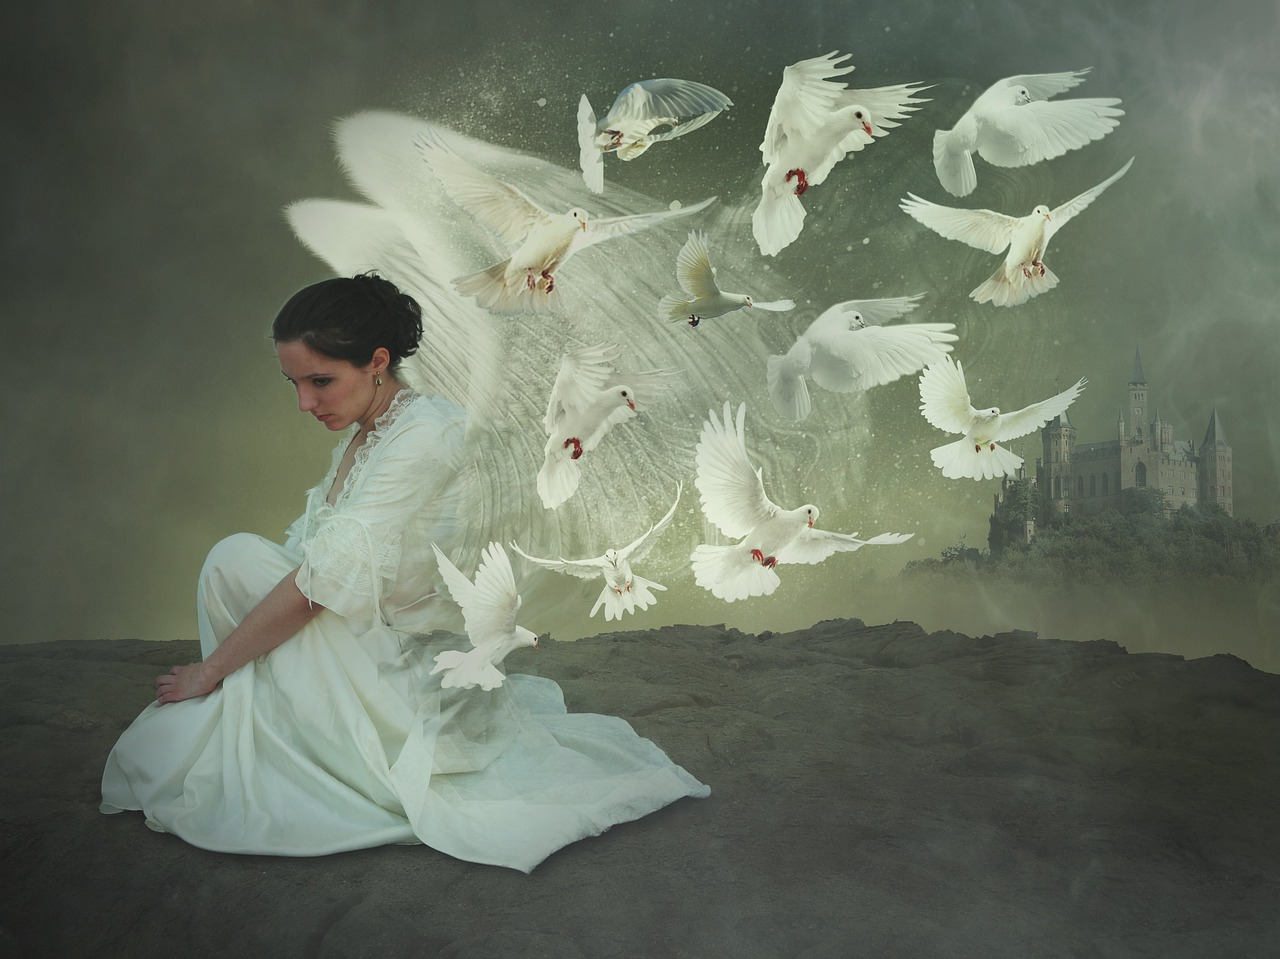 Wing-Angel-Sad-Fee-Woman-Adult-Fantasy-Human-3047248-1